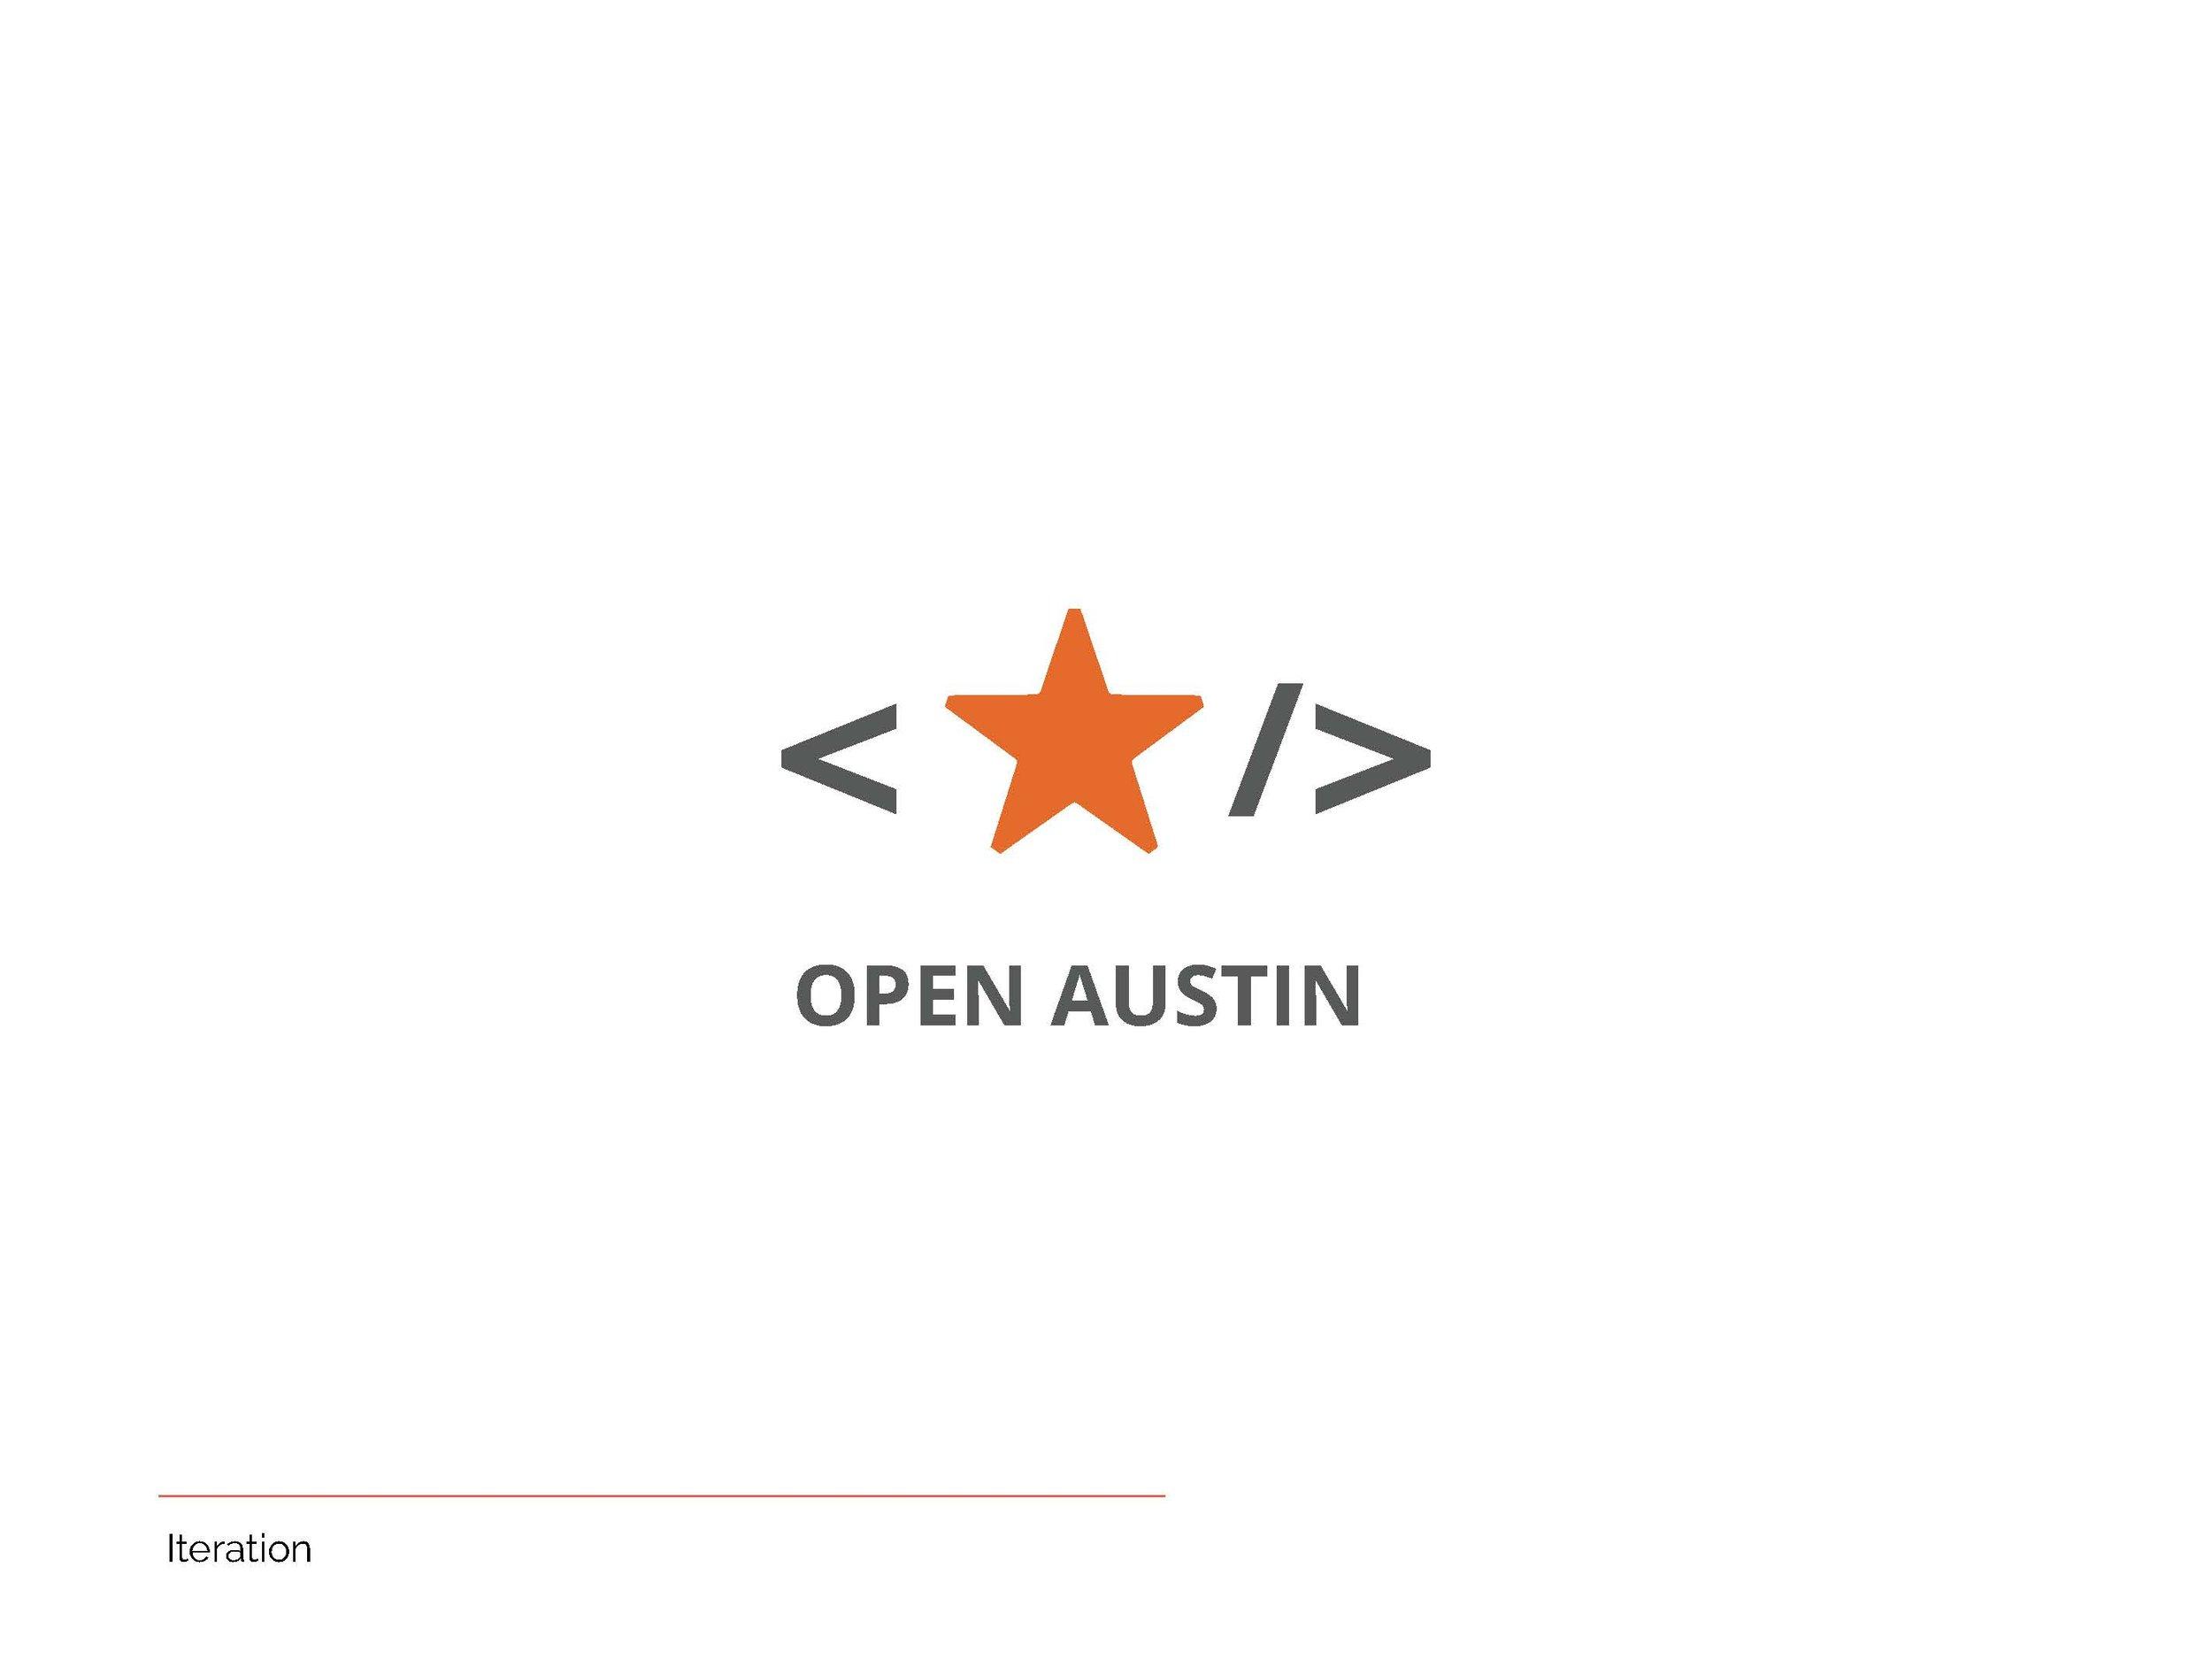 openaustinlogopresentation-160116162033_Page_11.jpg